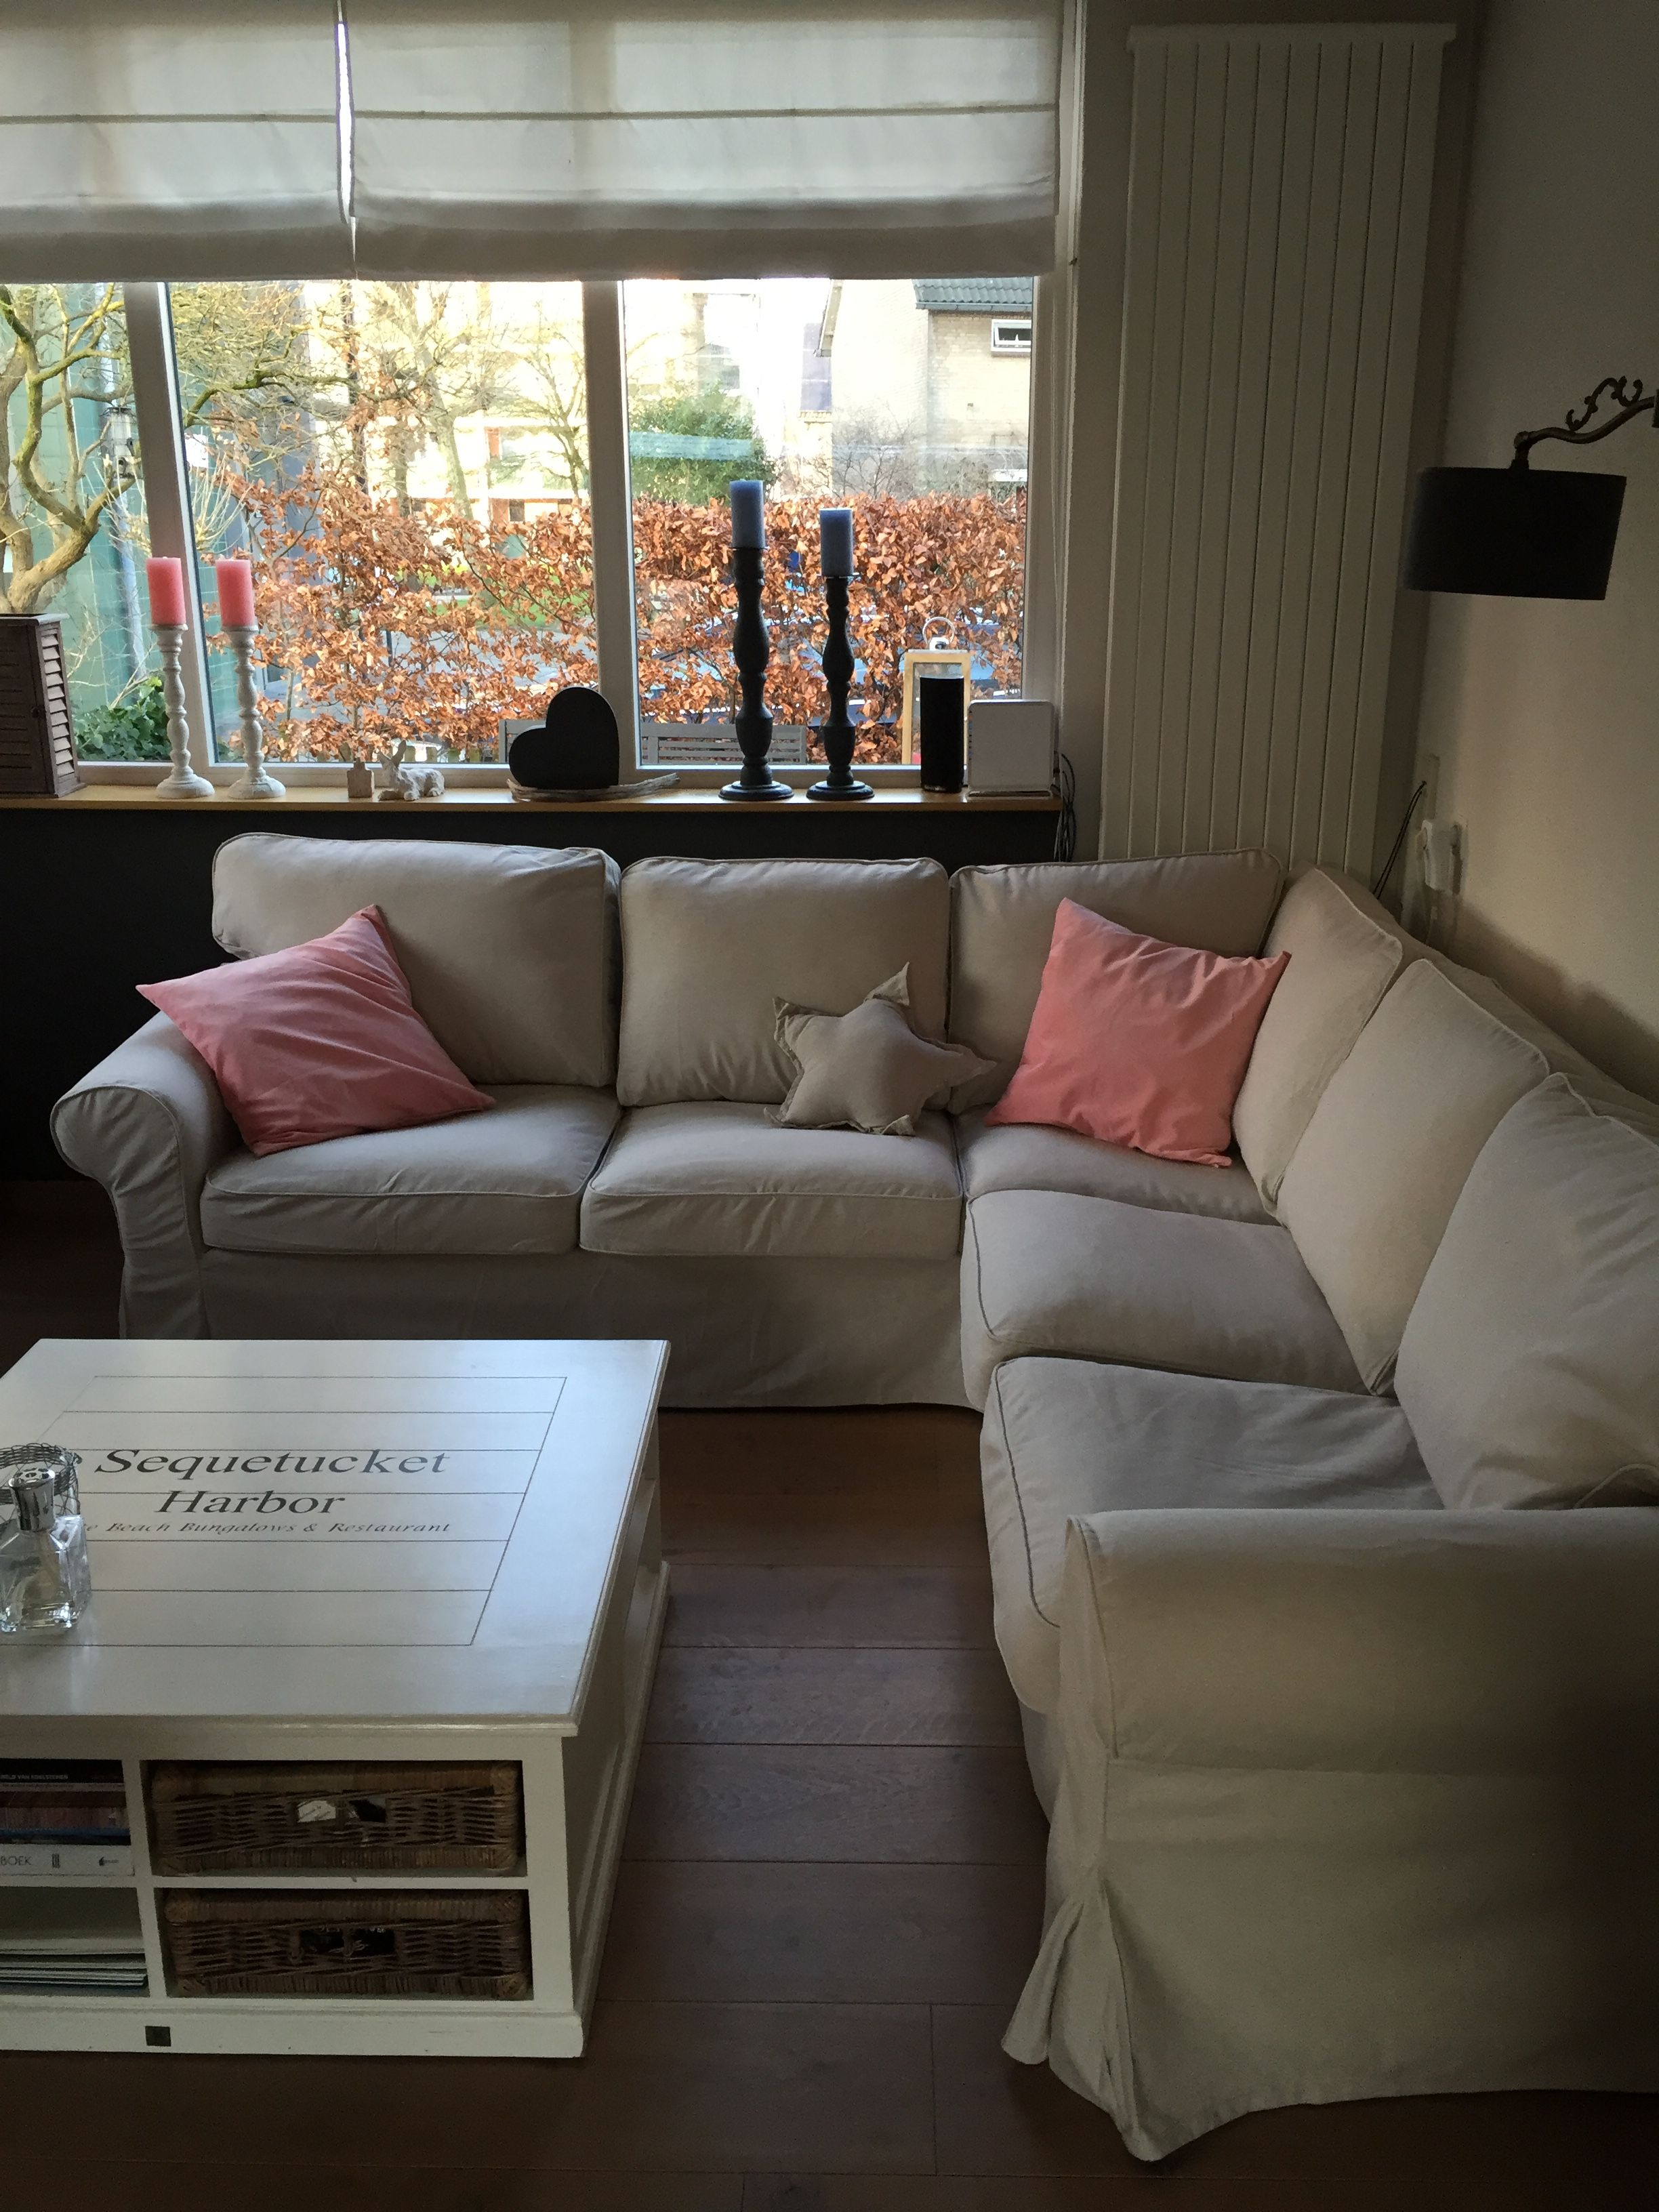 Sectional Sofa Sleeper Small